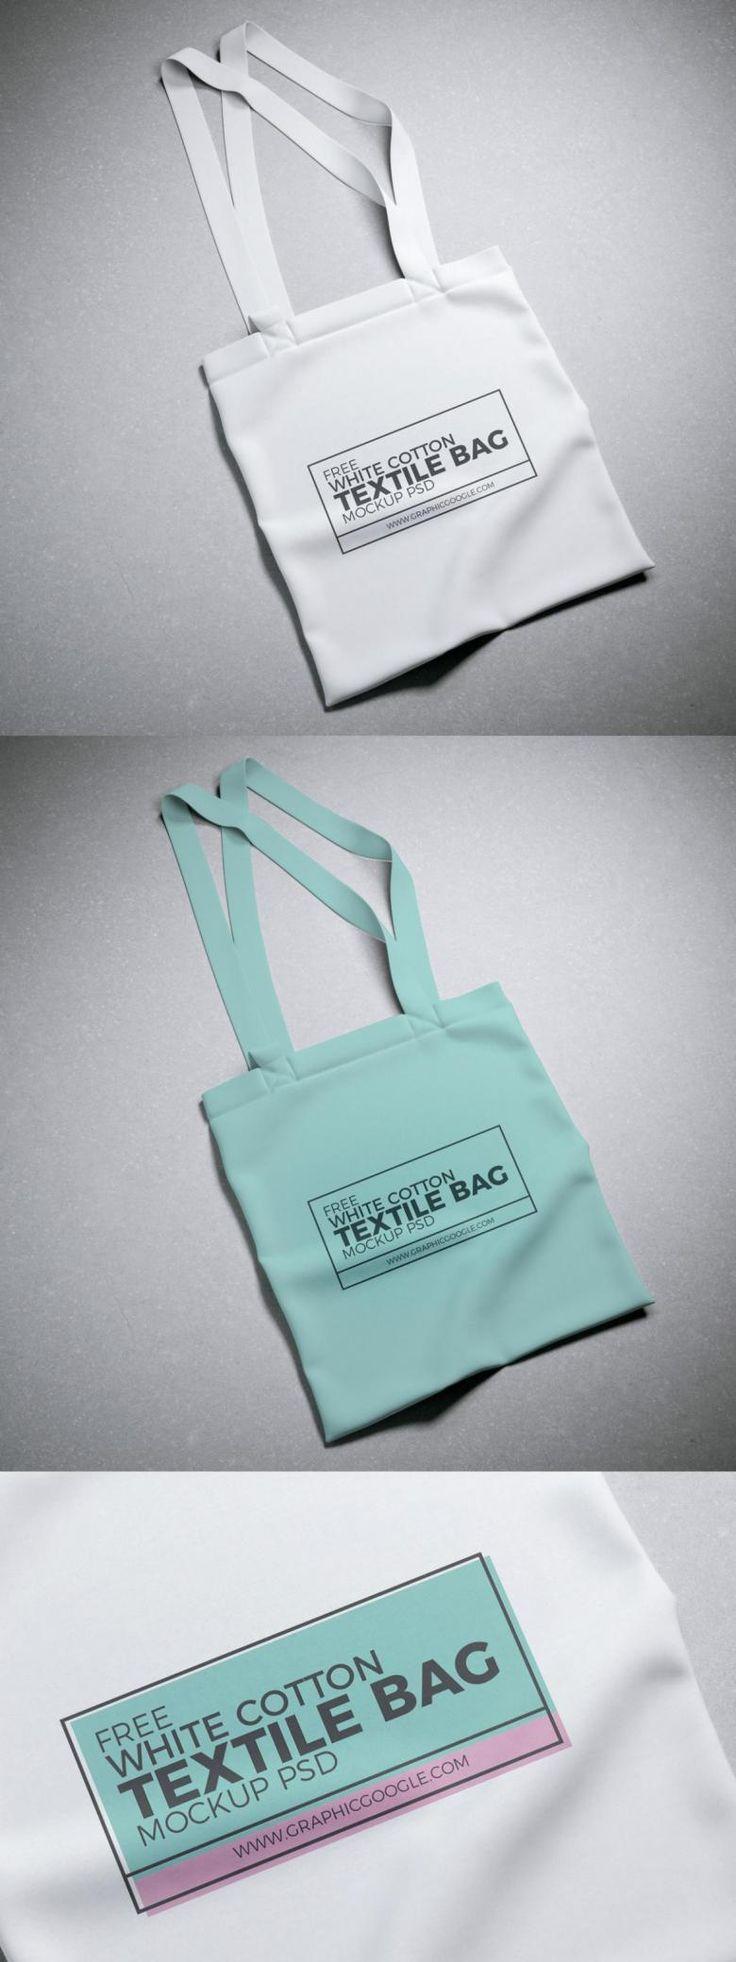 Download Free Cotton Tote Bag Mockup